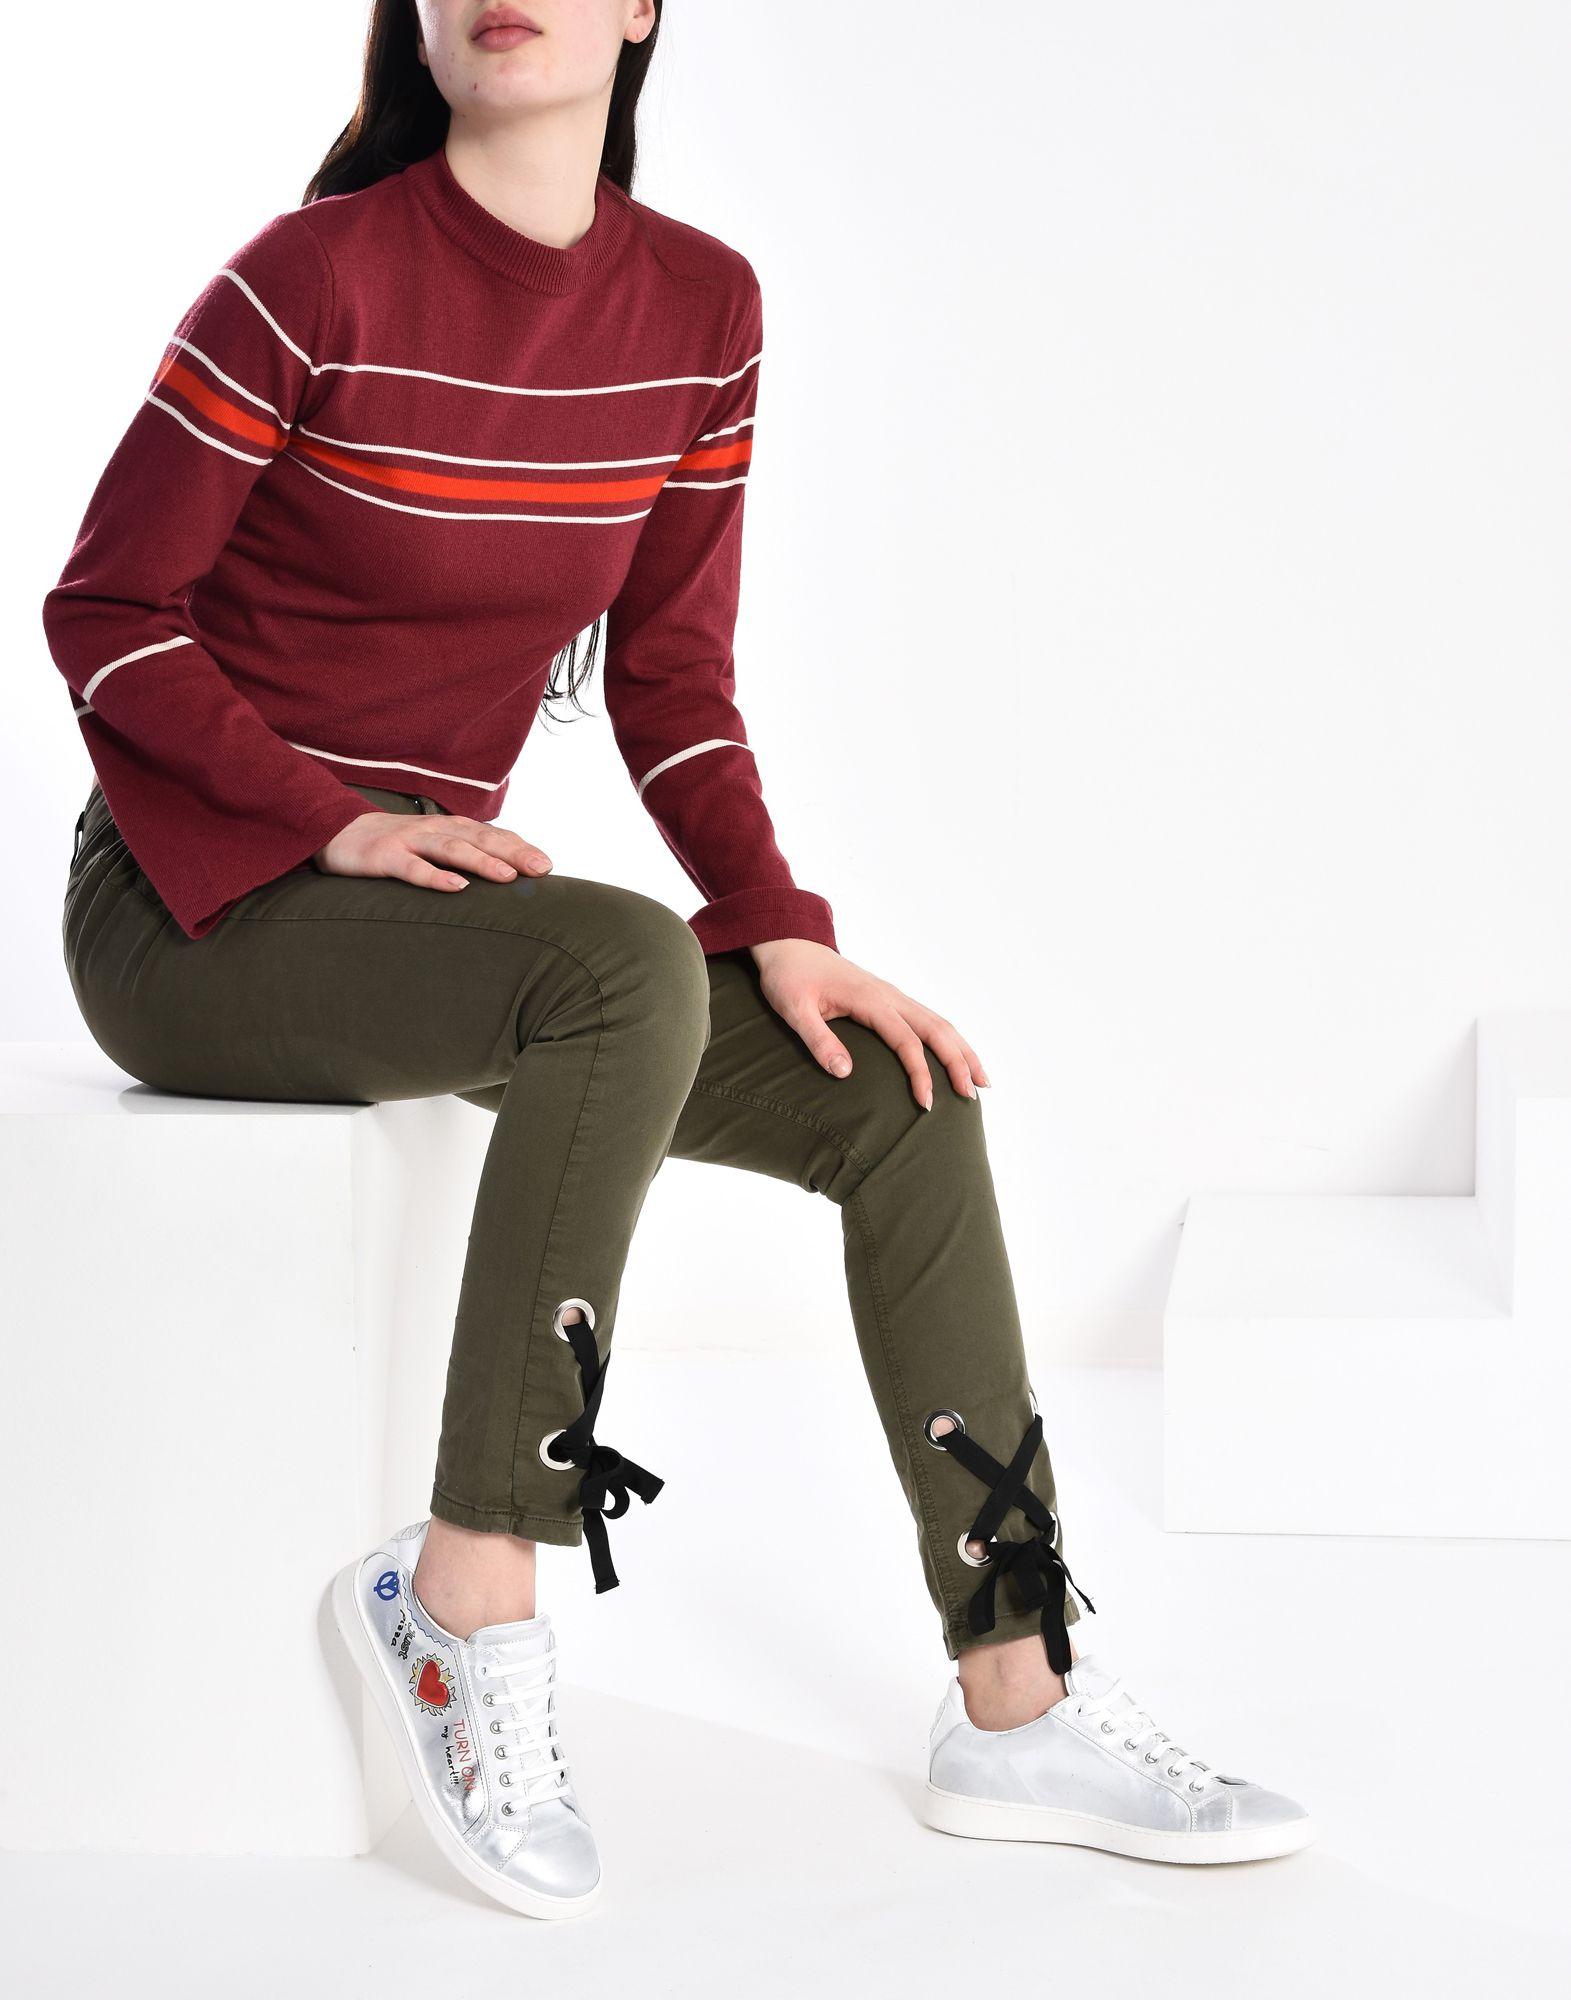 Pierre Darré Sneakers Damen  11430208RX Gute Qualität beliebte Schuhe